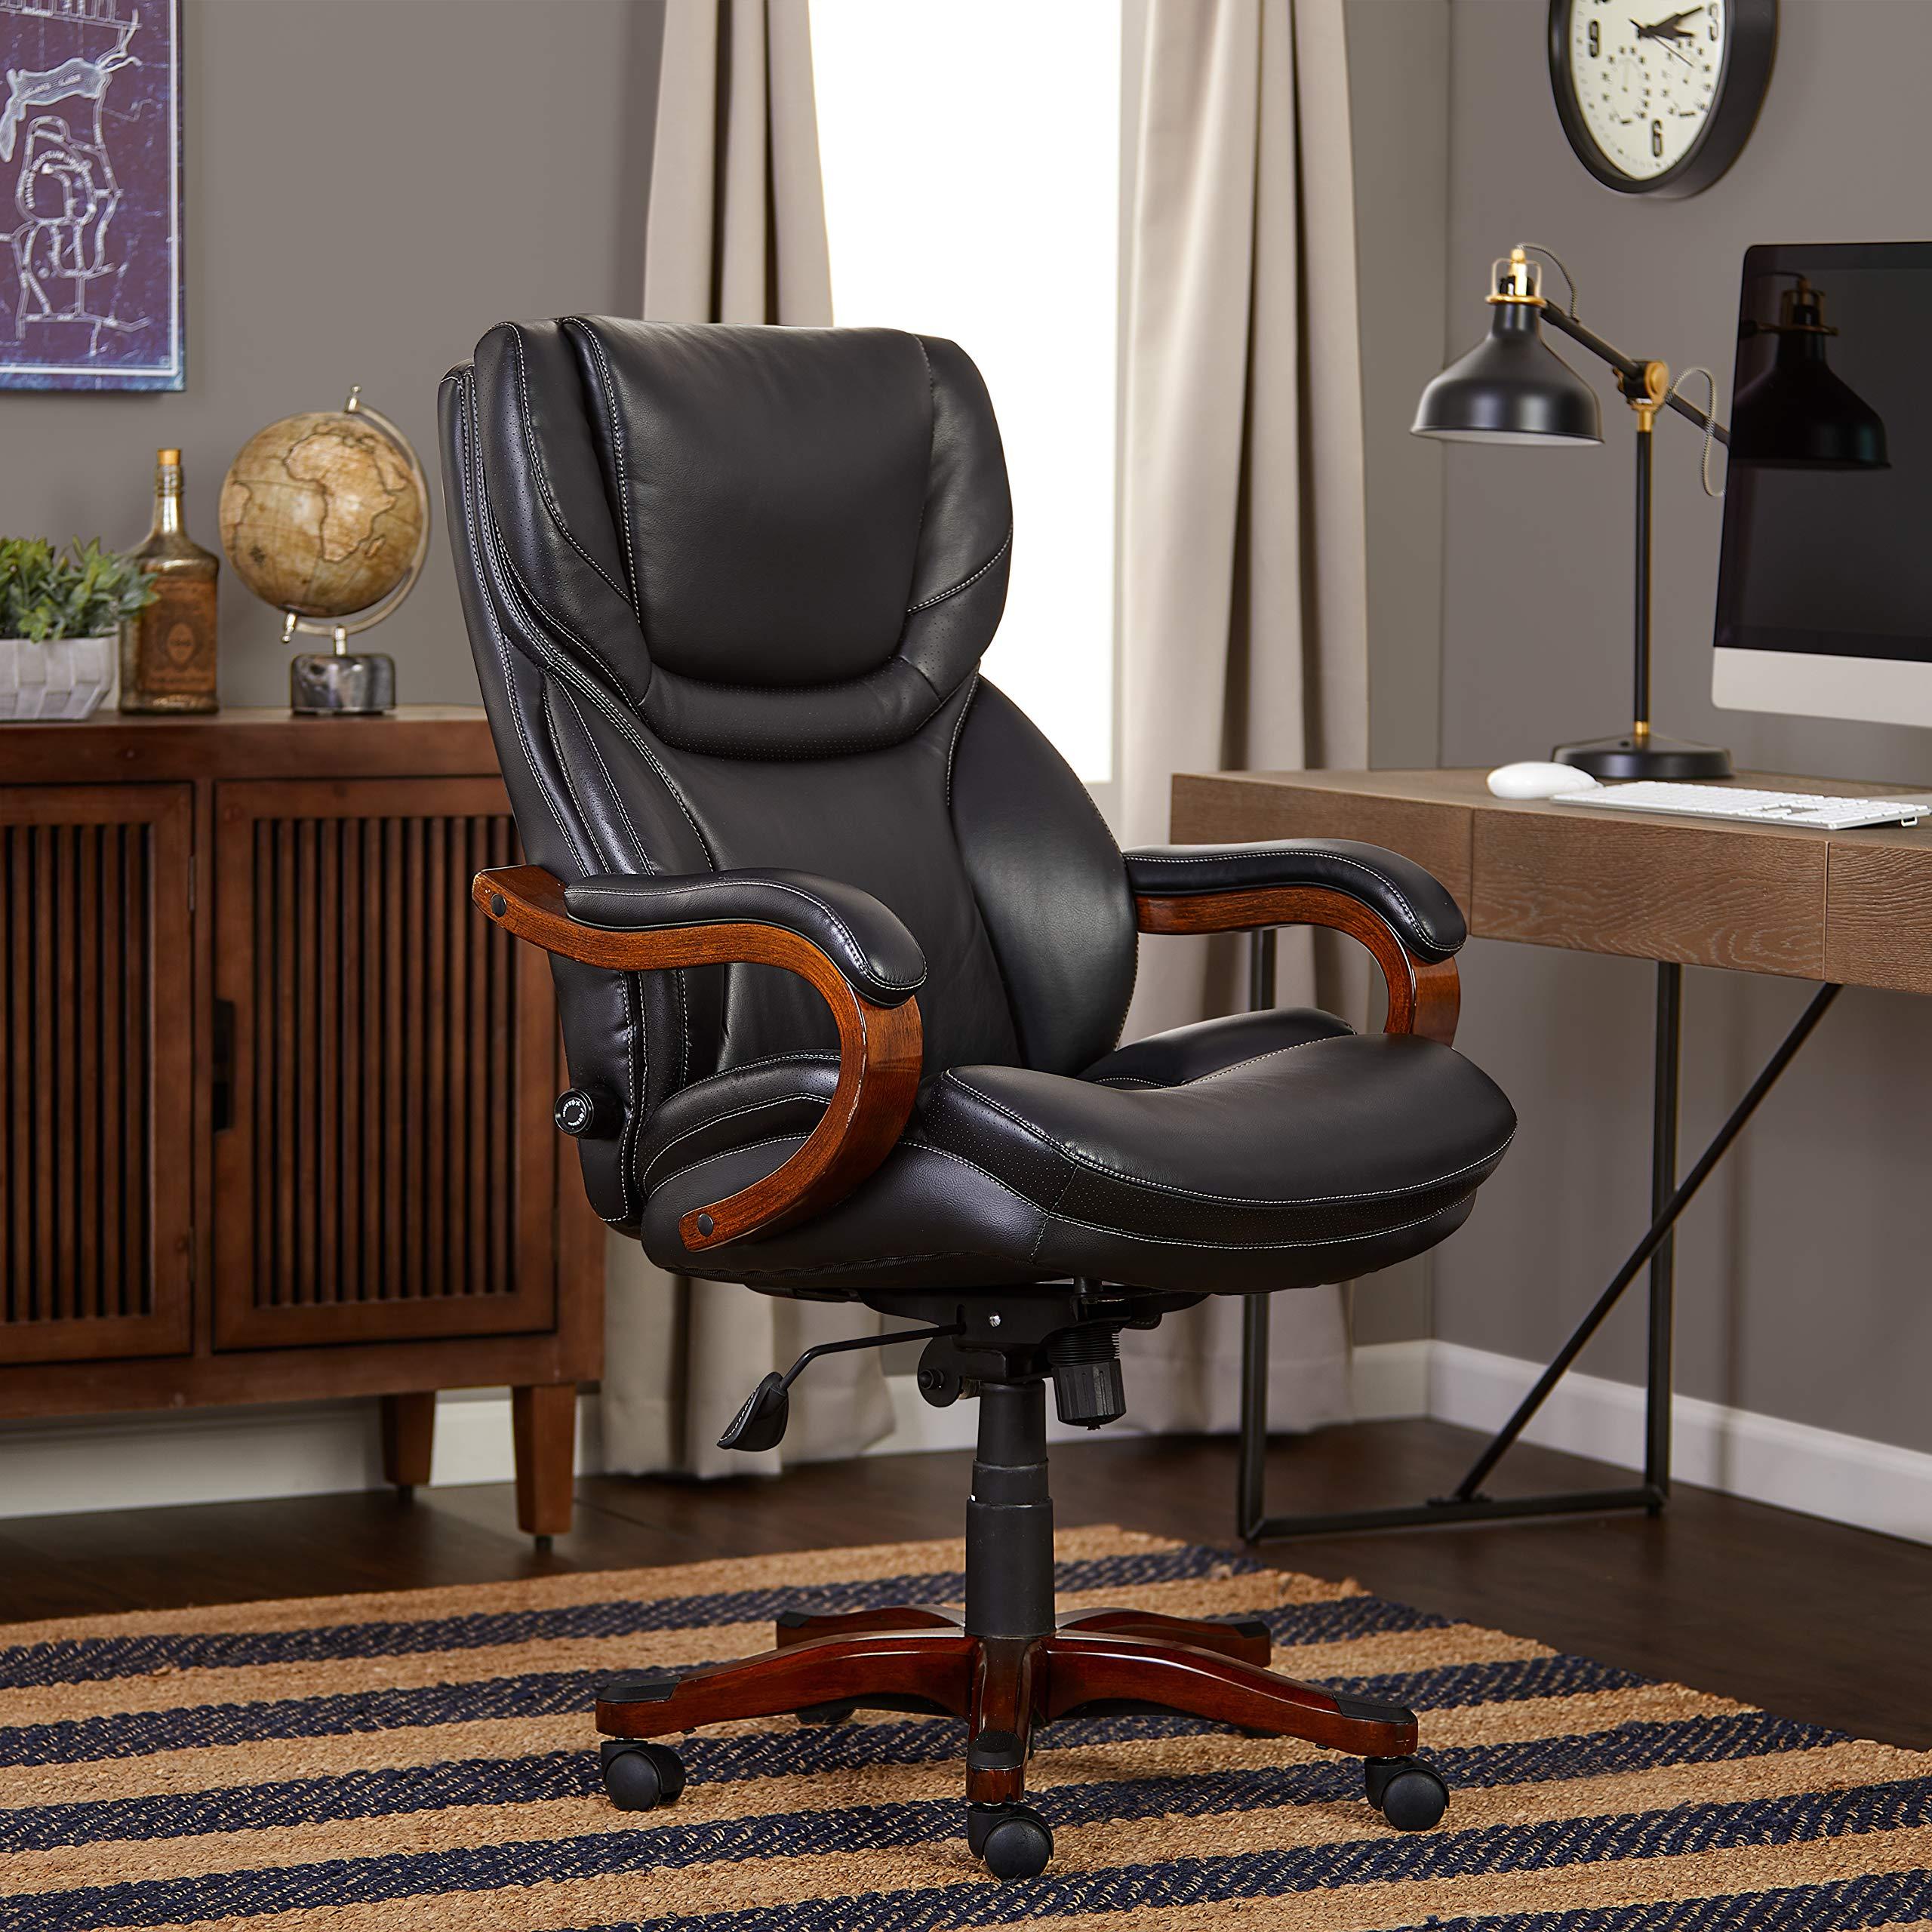 Serta Executive Office Bonded Leather